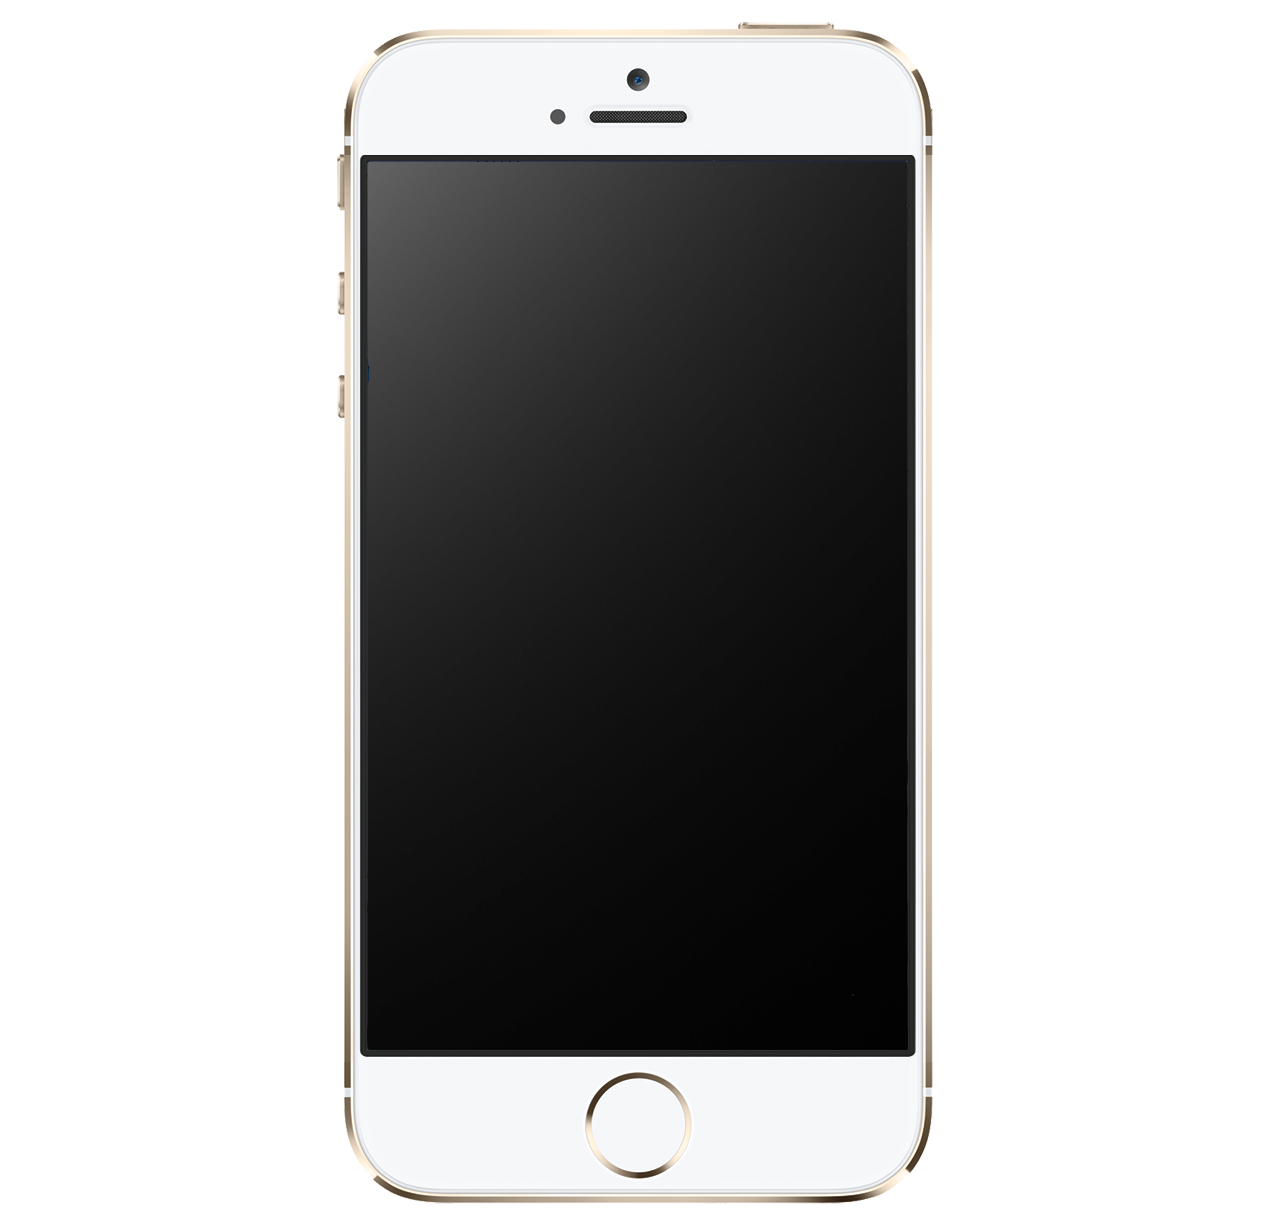 iPhone 7 Plus IPhone 8 Plus iPhone 6 Screen Protectors Telephone.